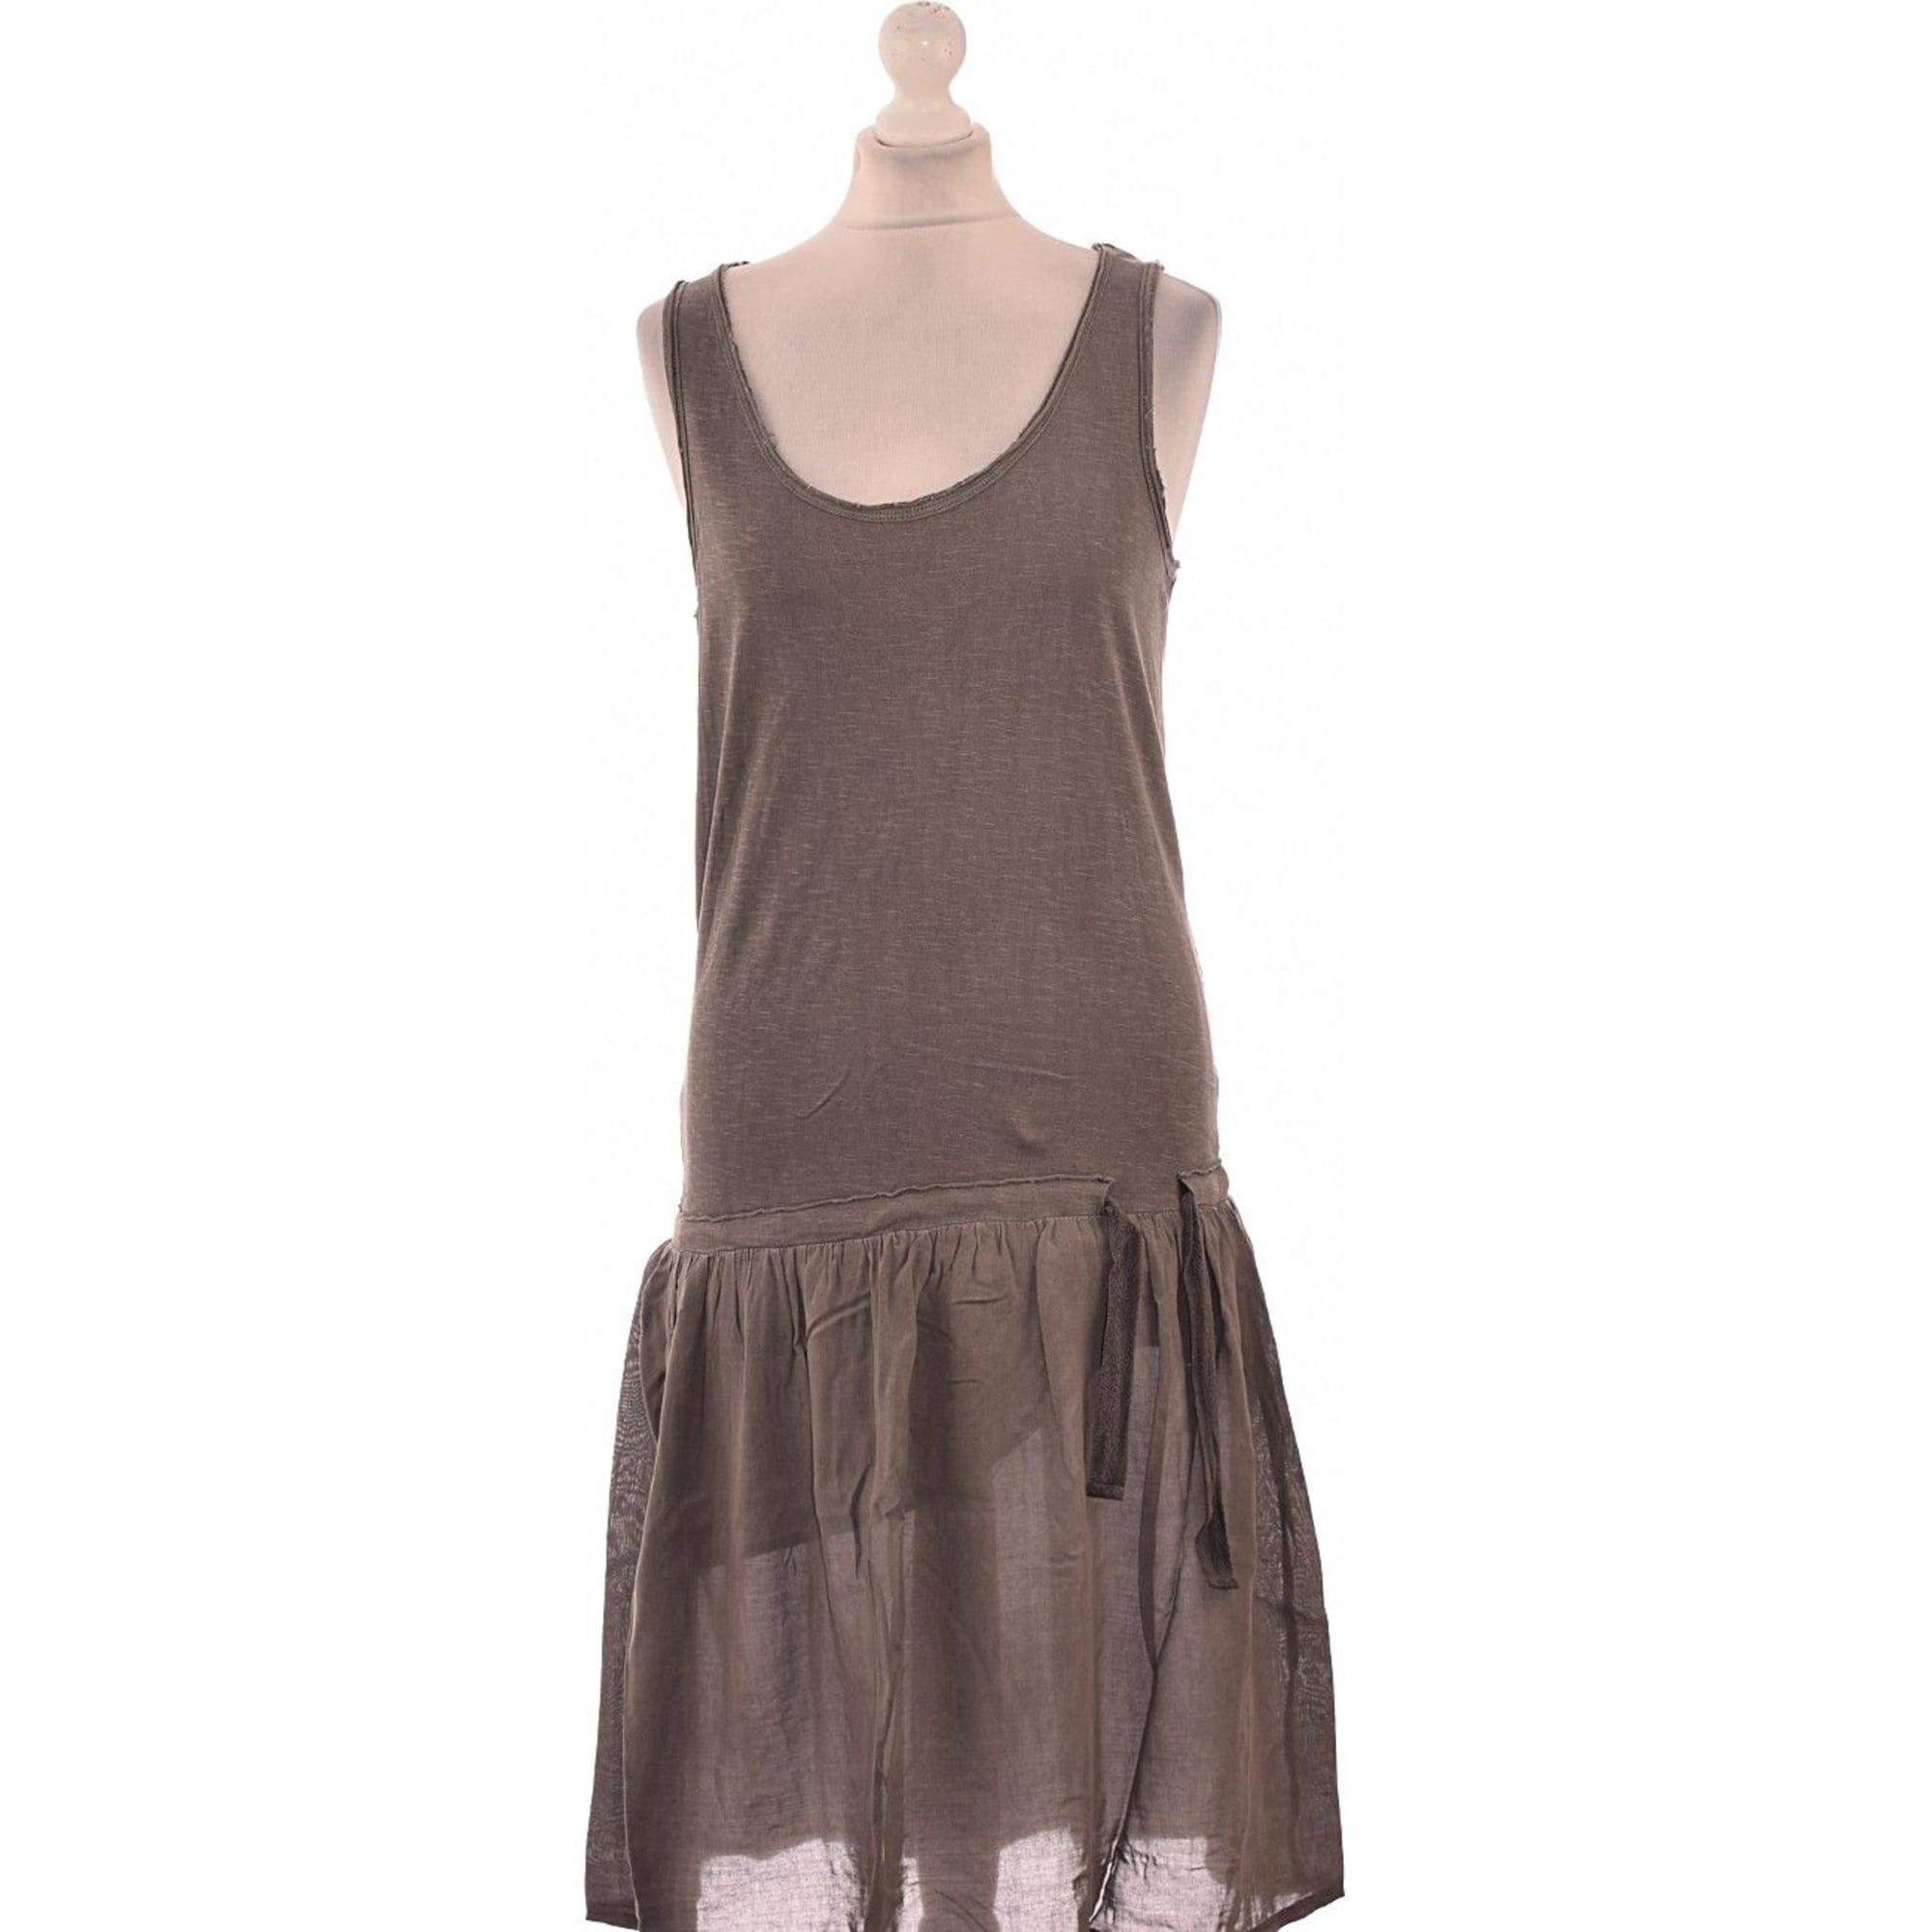 Midi Dress ESPRIT Gray, charcoal